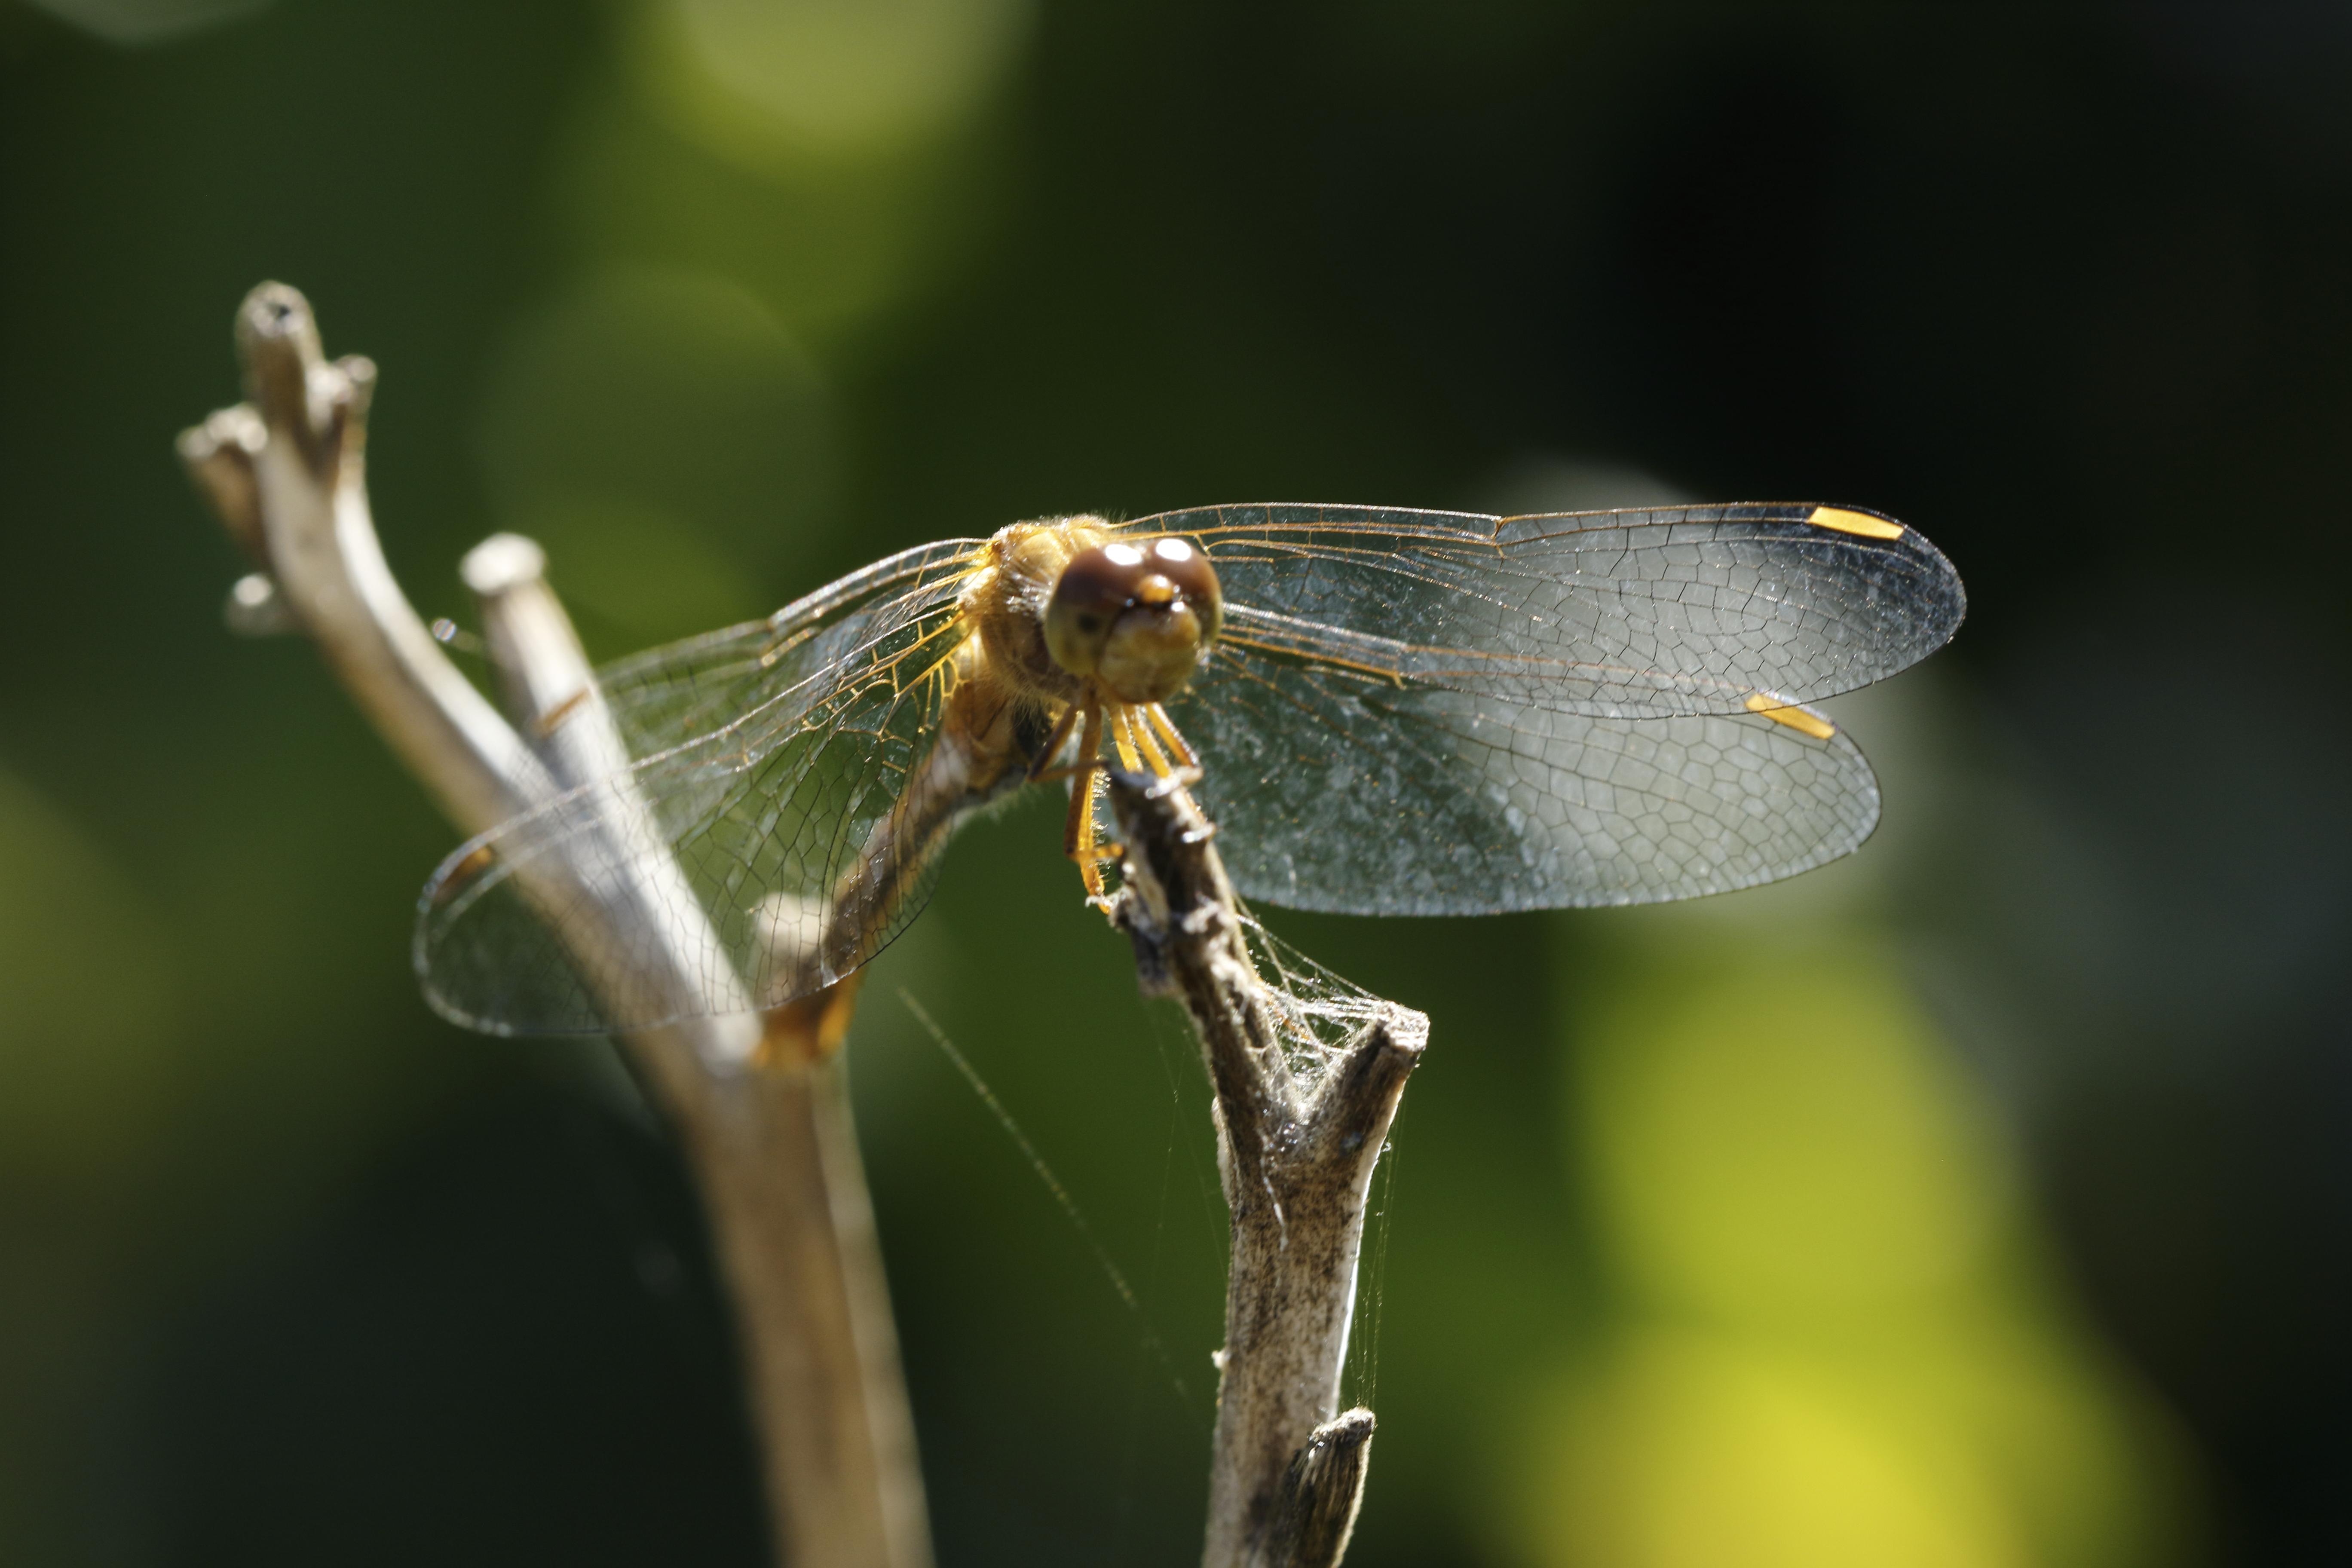 blog photo 29 the dragonfly.JPG